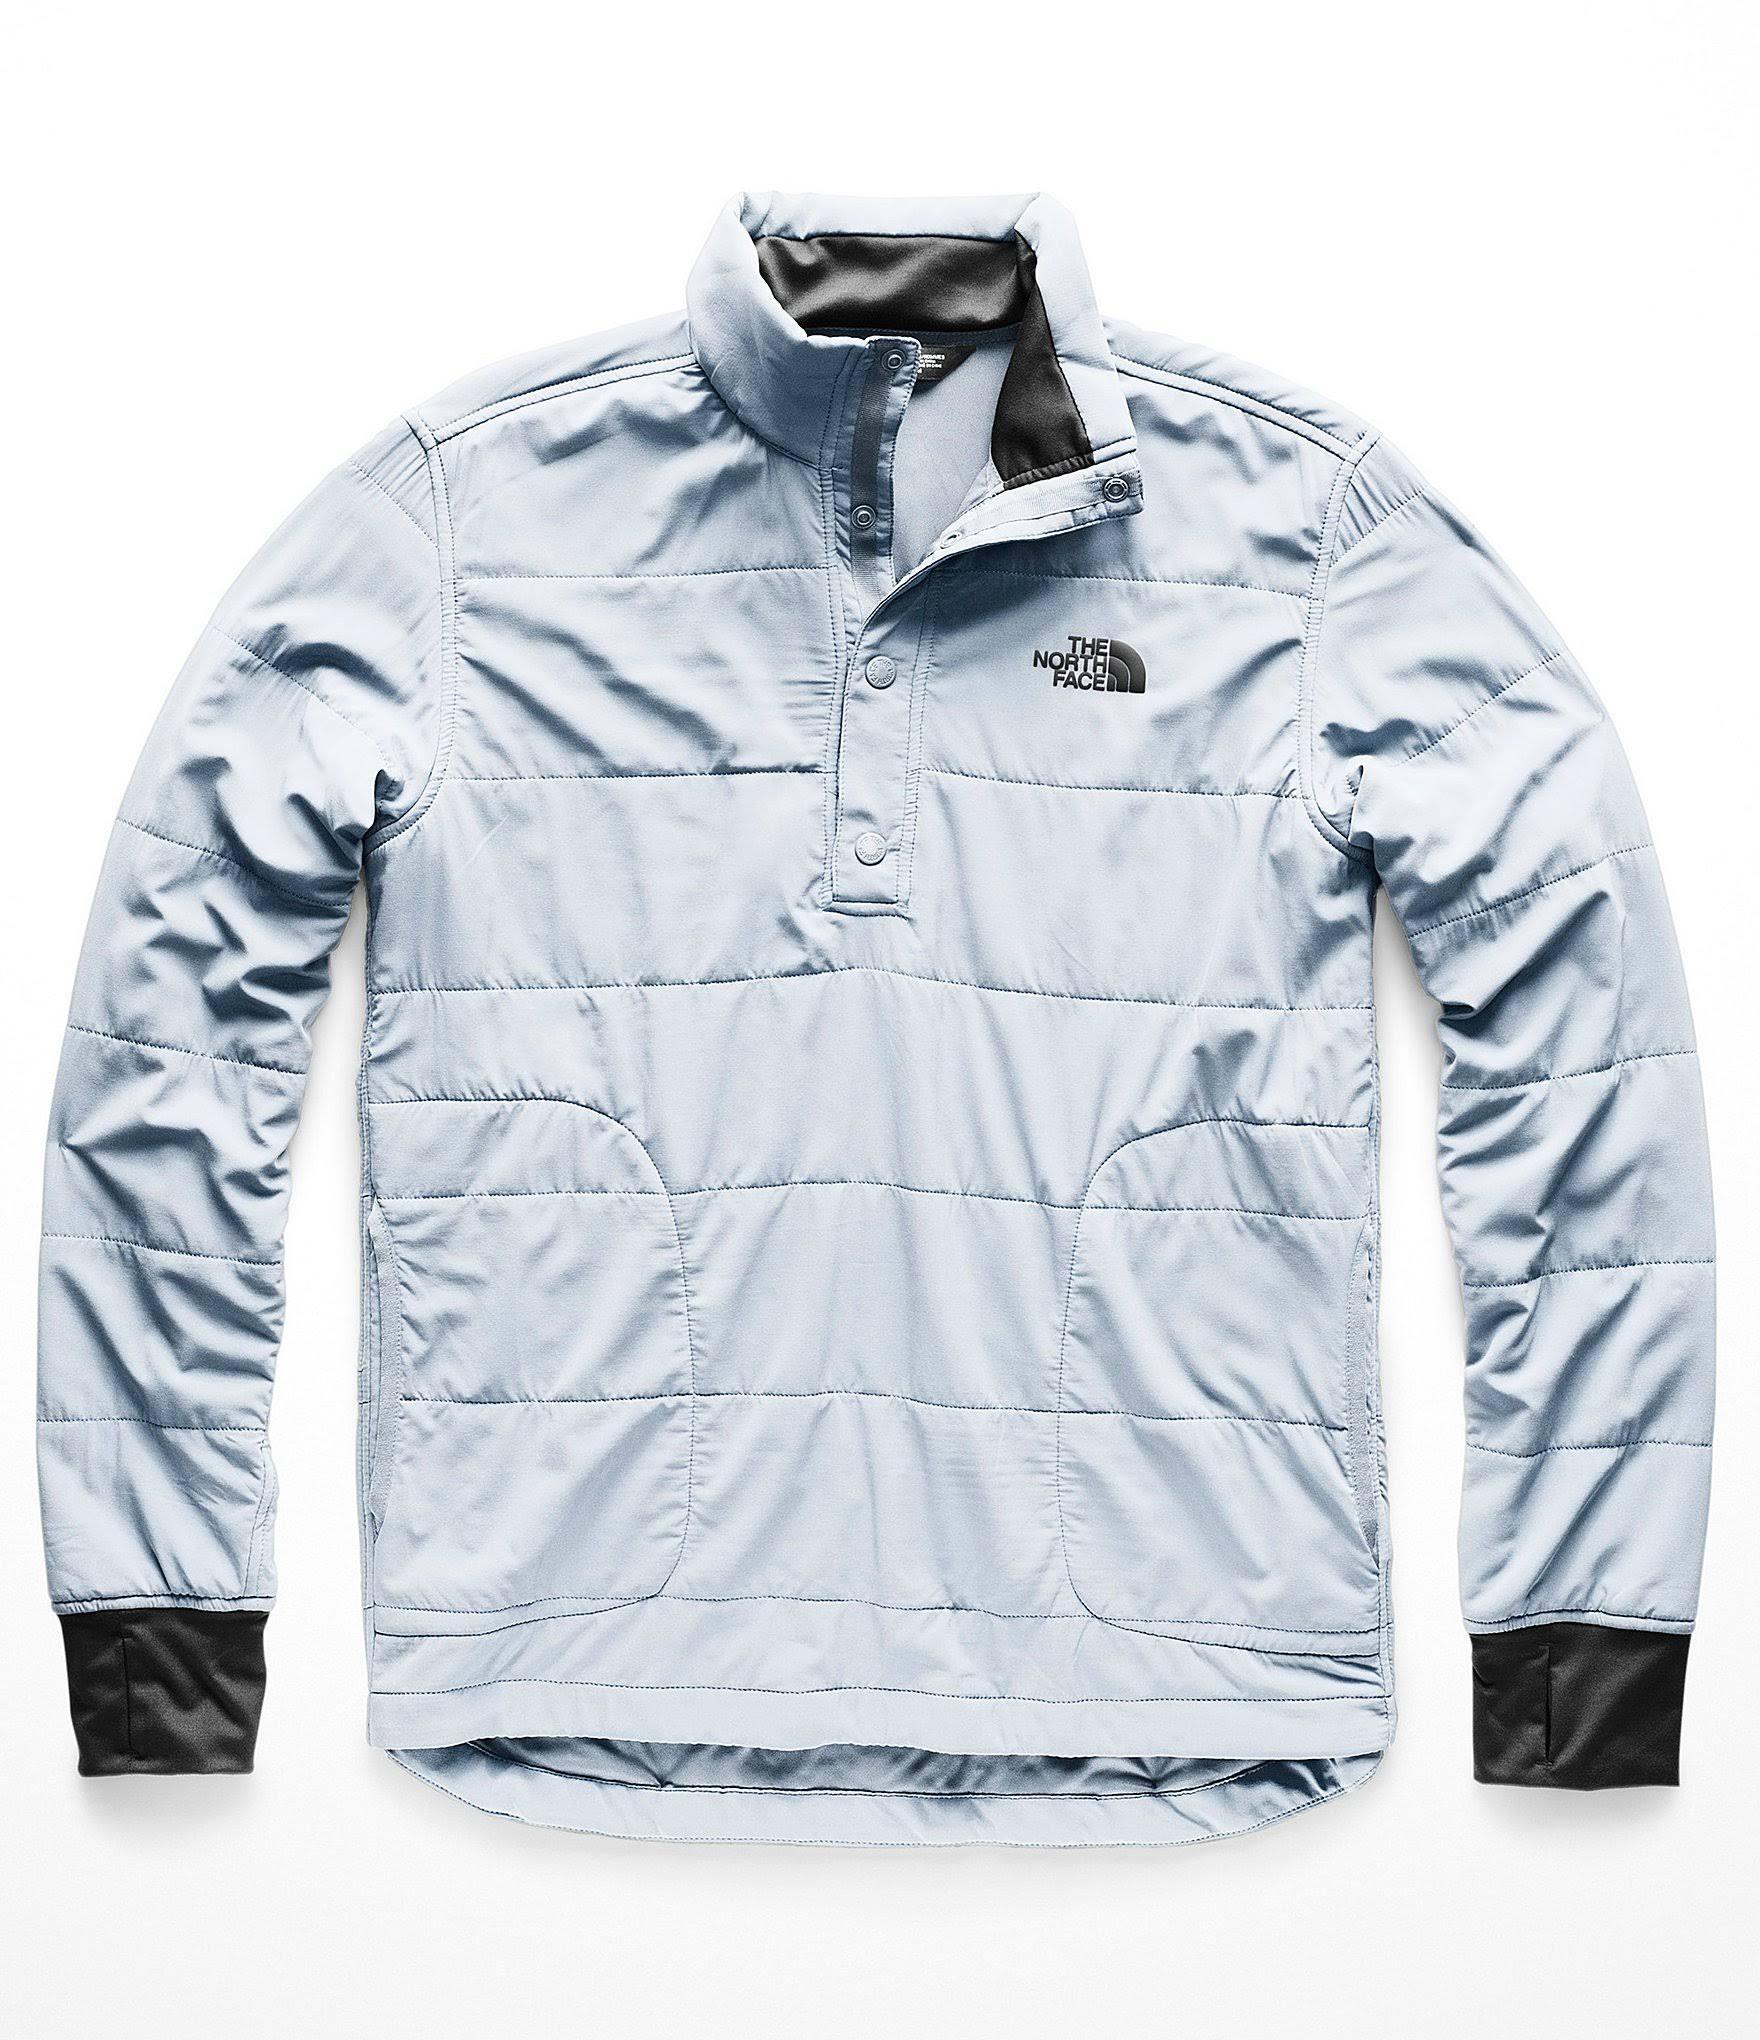 S North 1 The Face Sweatshirt Herren Gull Blue Snap 4 Berg Neck fwq1qSPx